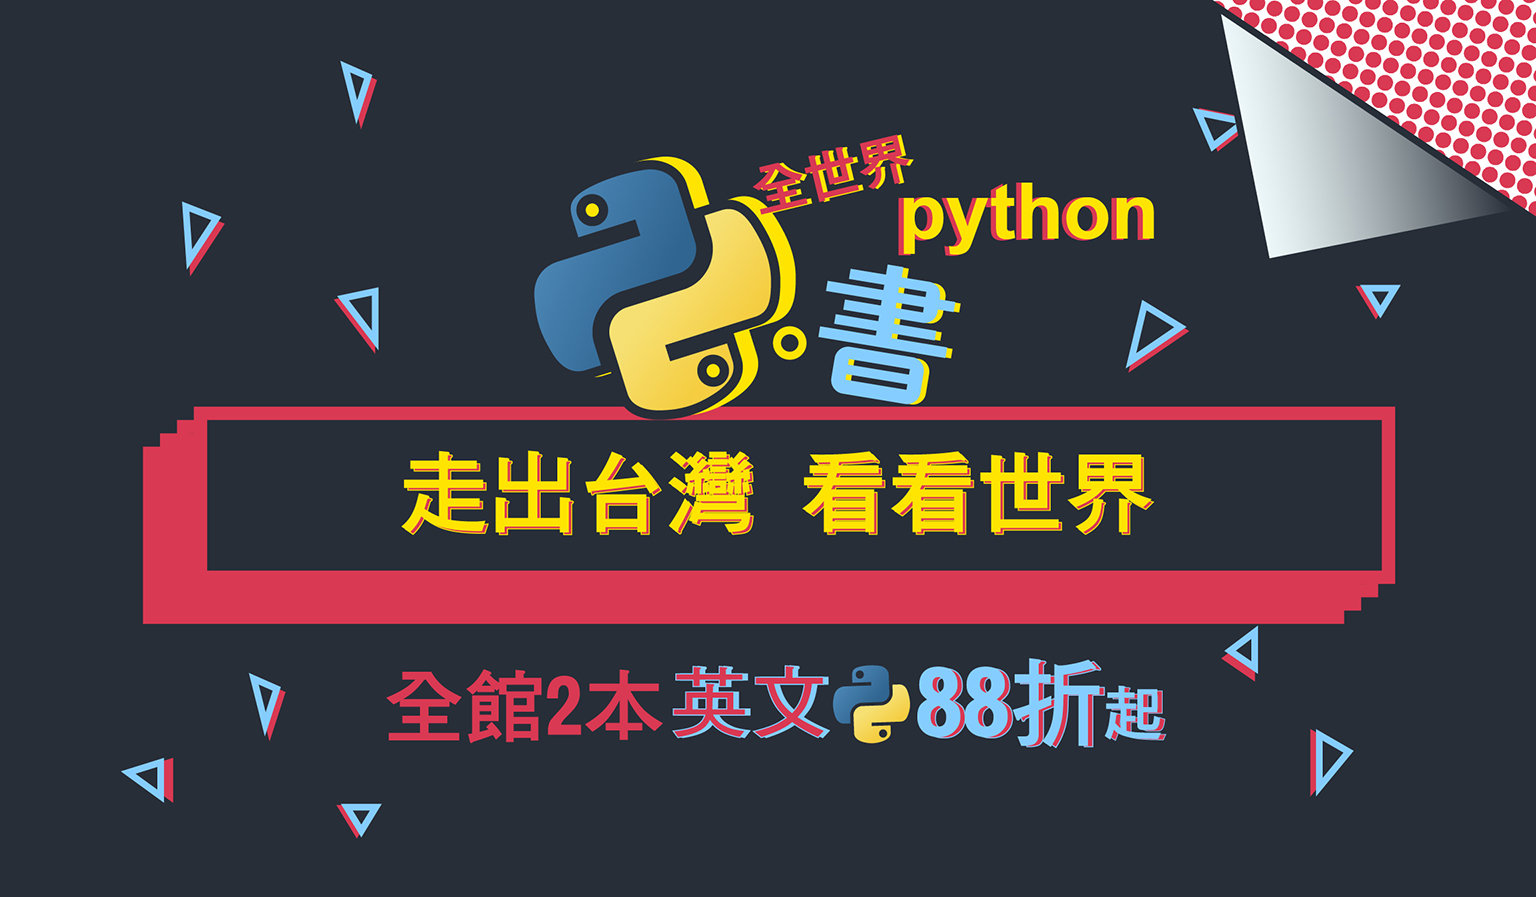 20180917 python%e7%b0%a1%e4%b8%ad%e8%8b%b1%e6%96%87 big %e8%a4%87%e6%9c%ac1